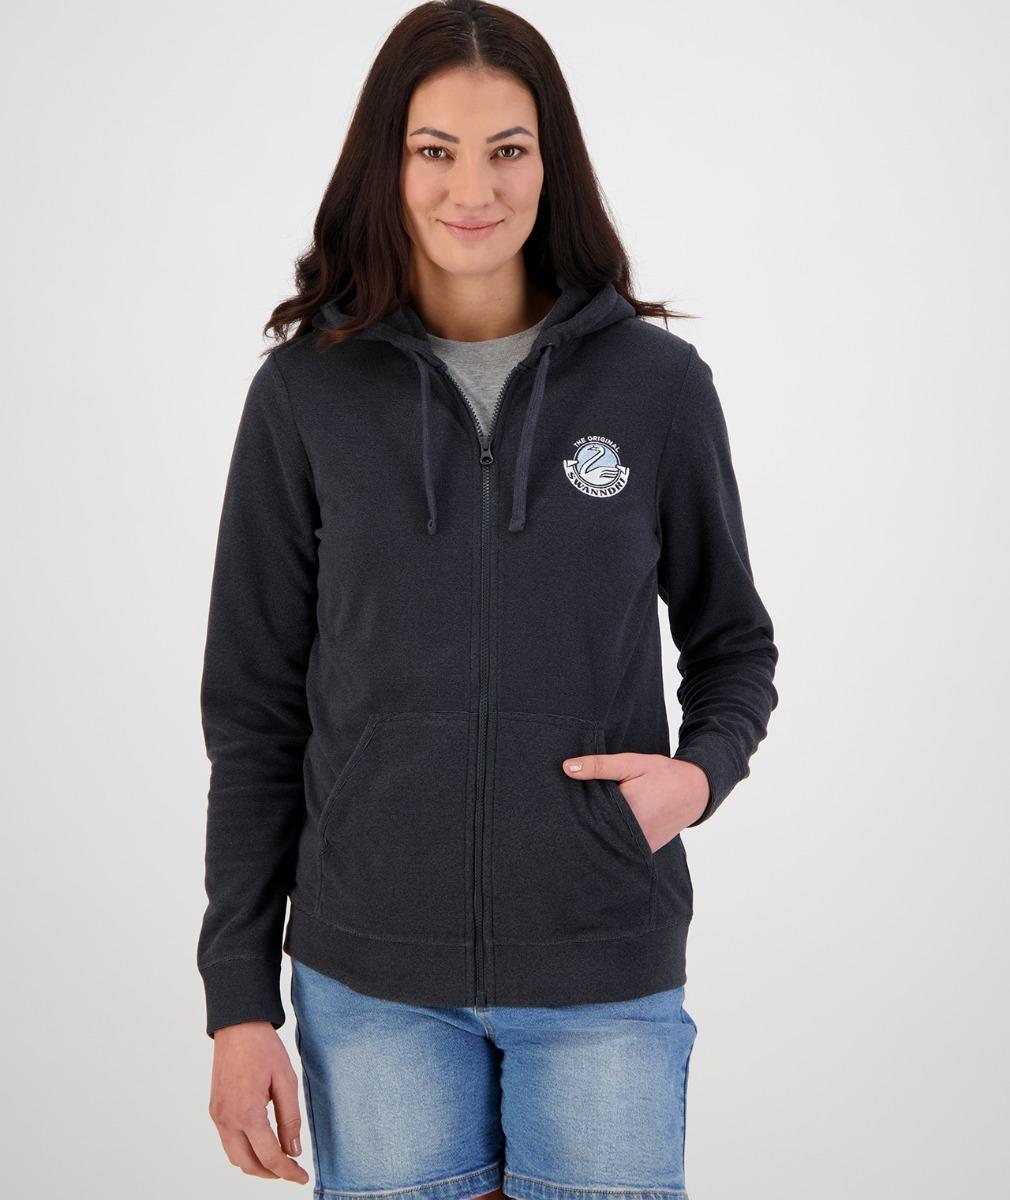 Swanndri Women's Anaheim Fleece Hoody in Dark Grey